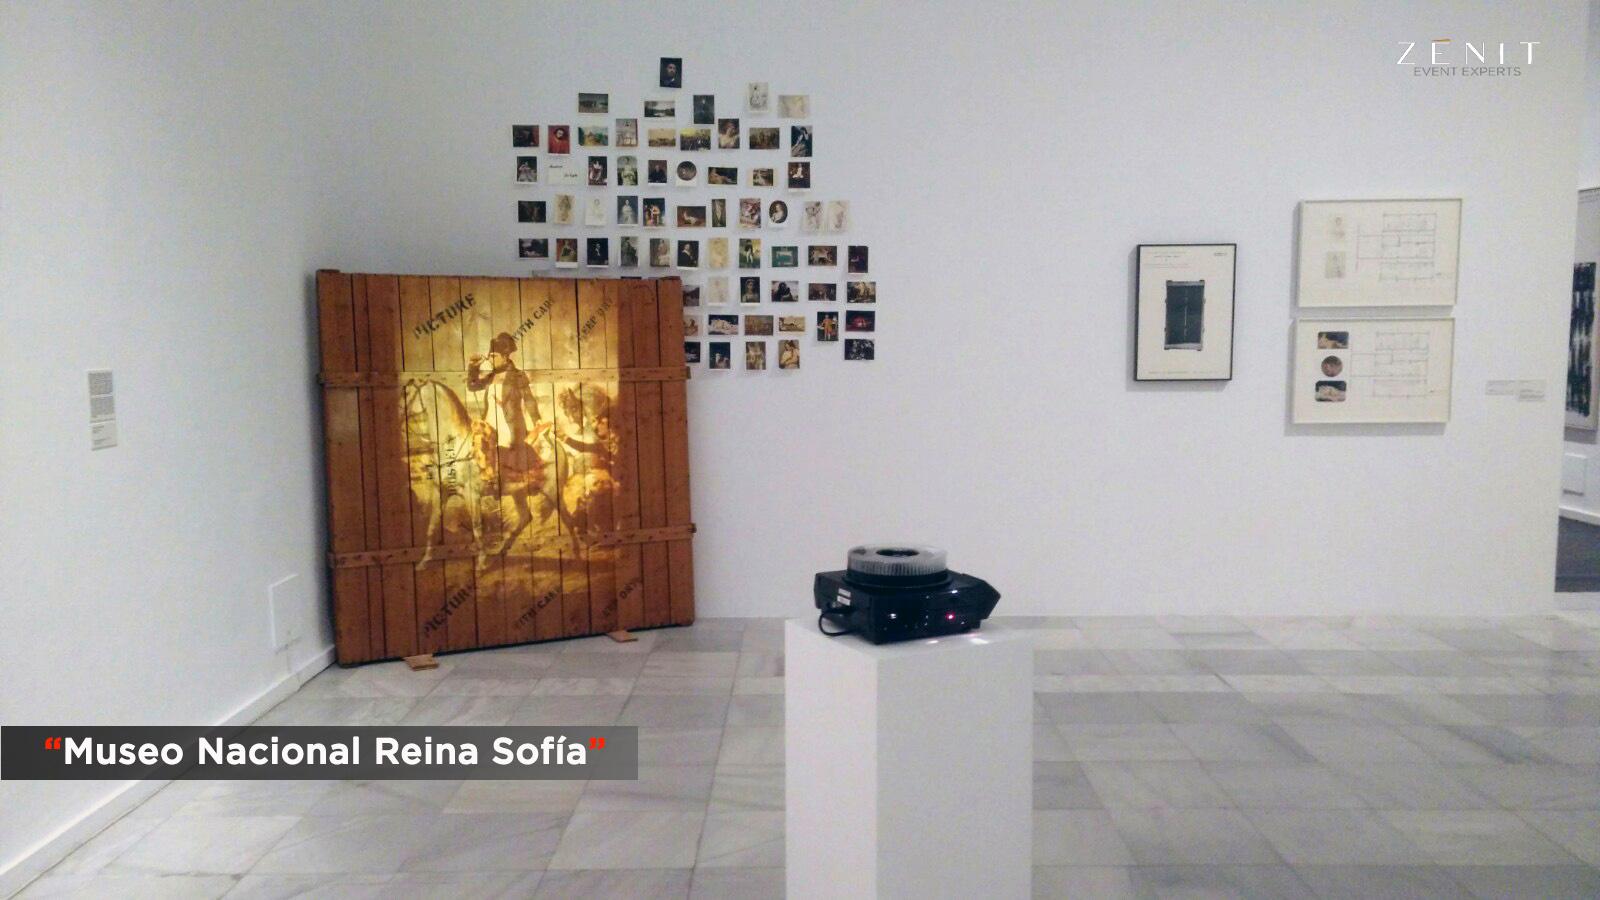 Zenit Event Experts. Museo Nacional Centro de Arte Reina Sofía.